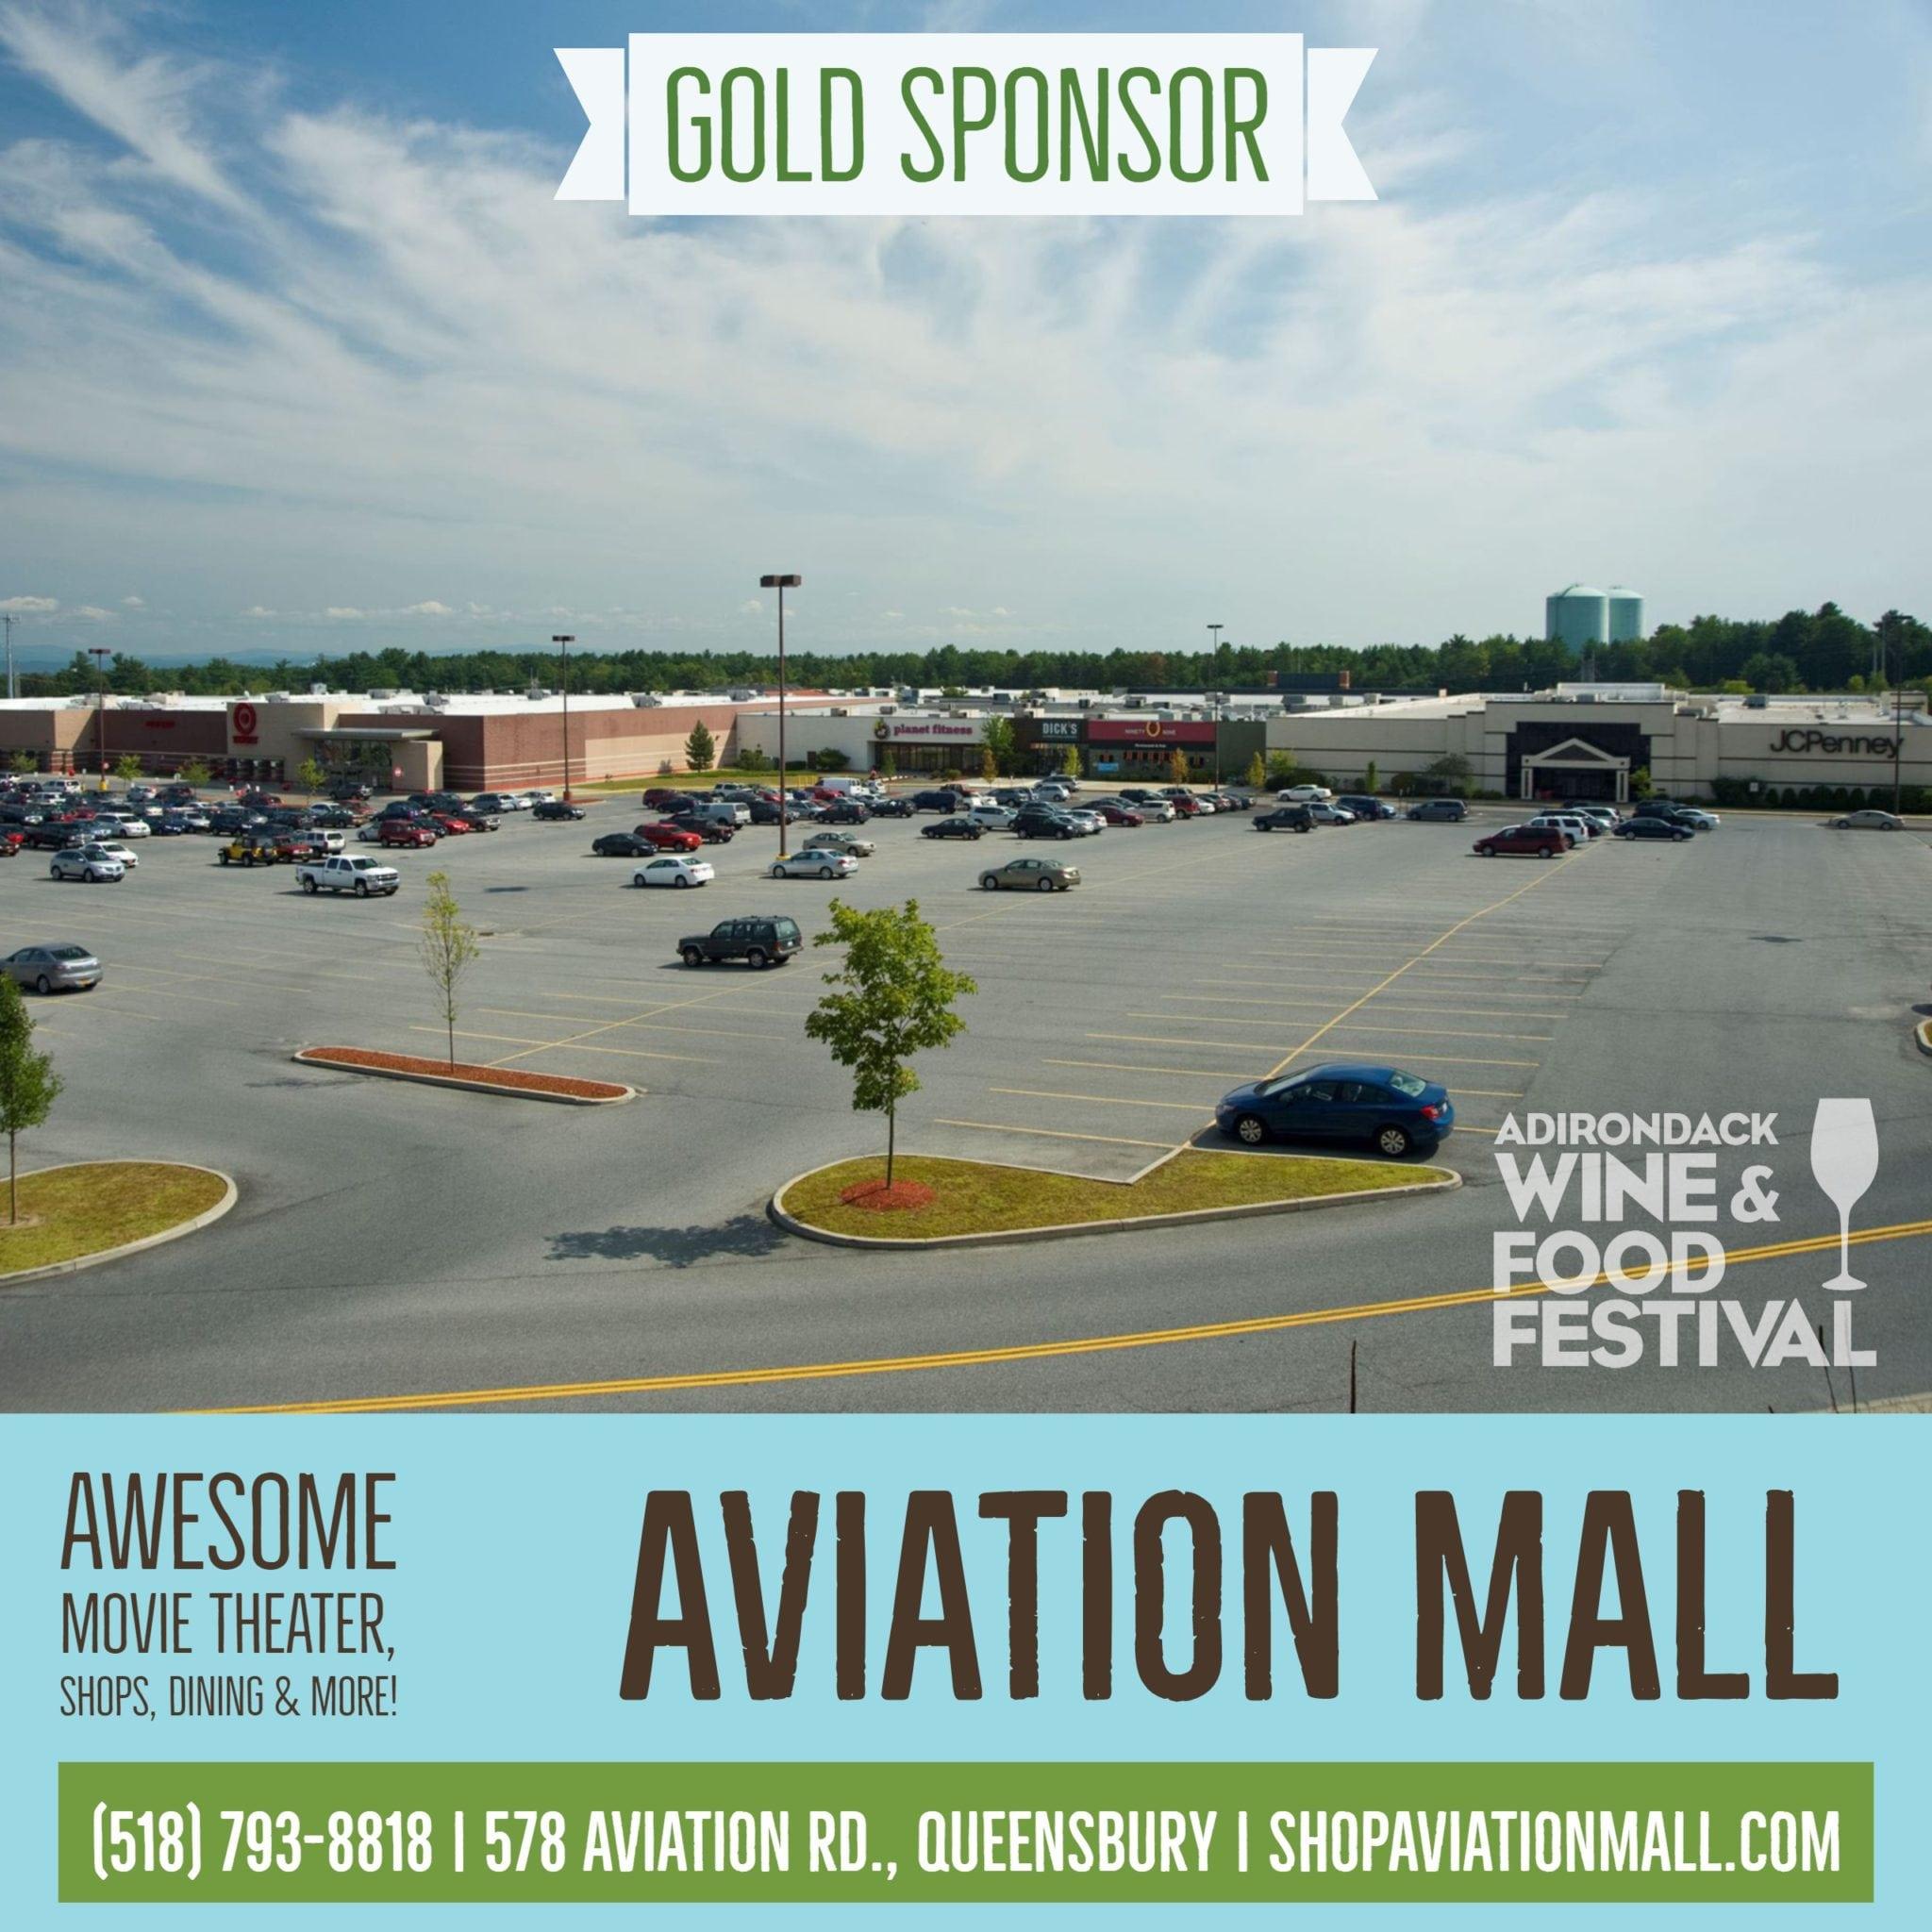 Aviation Mall Queensbury